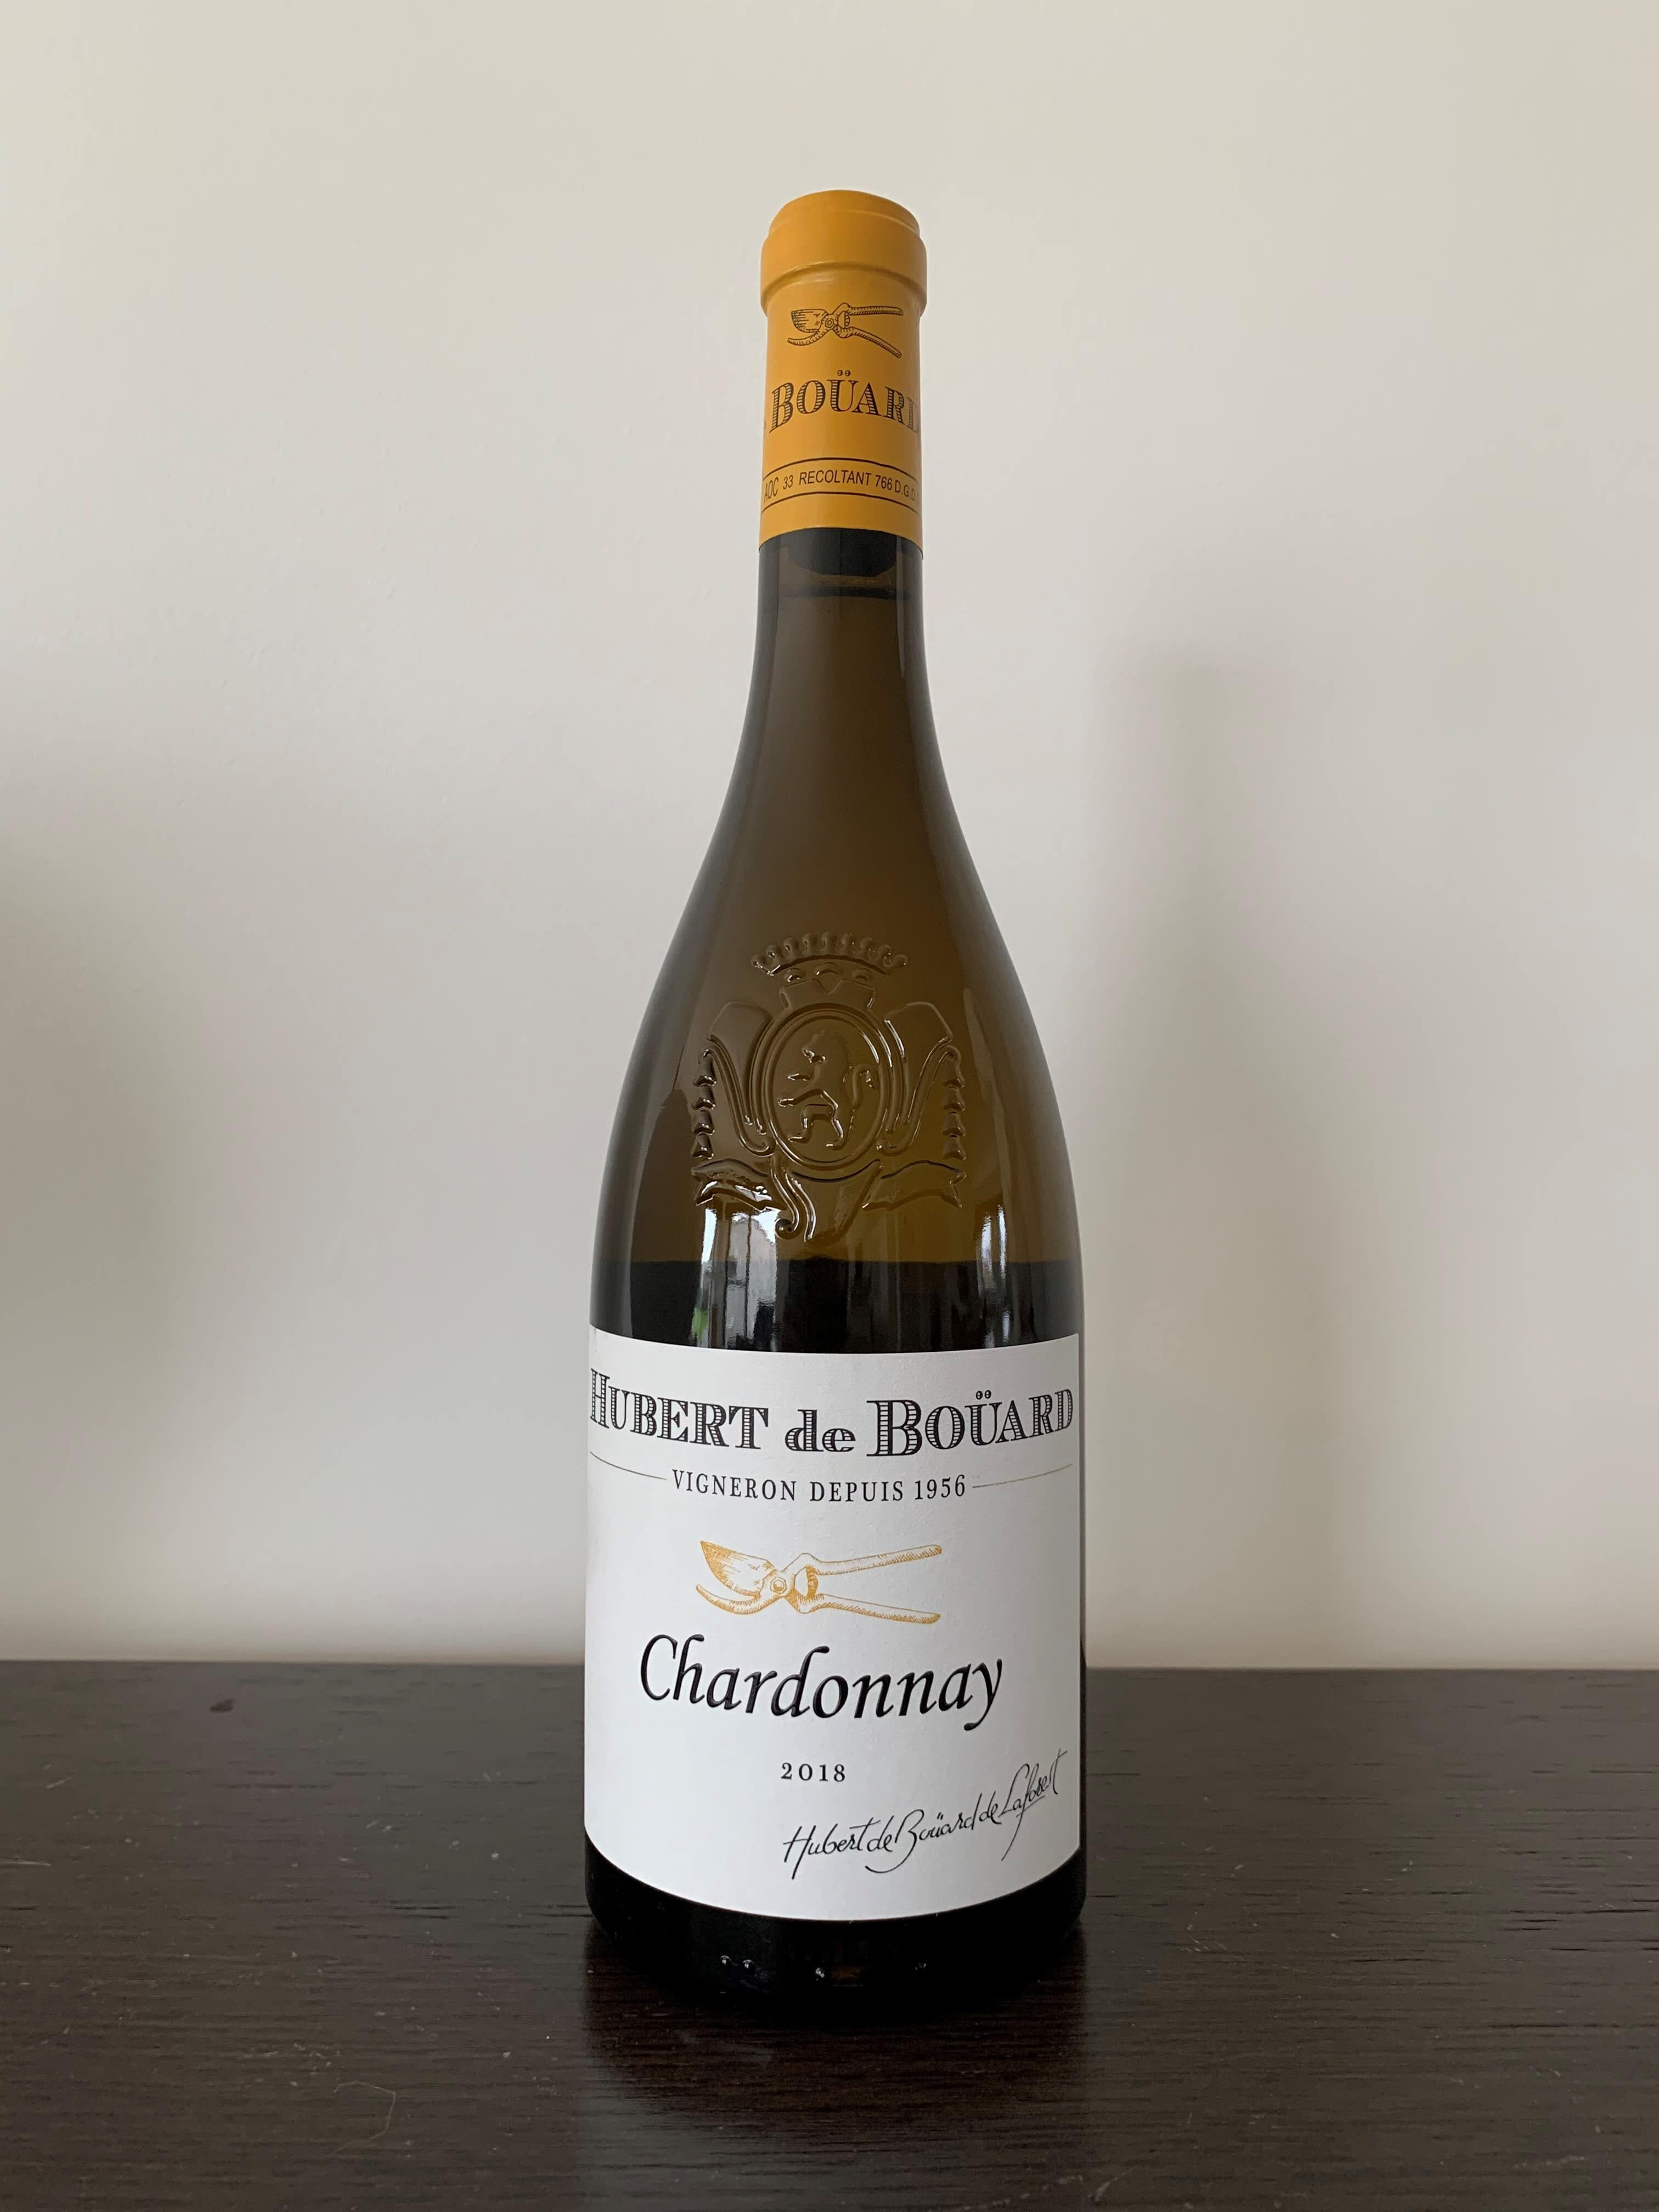 Hubert de Bouard Chardonnay